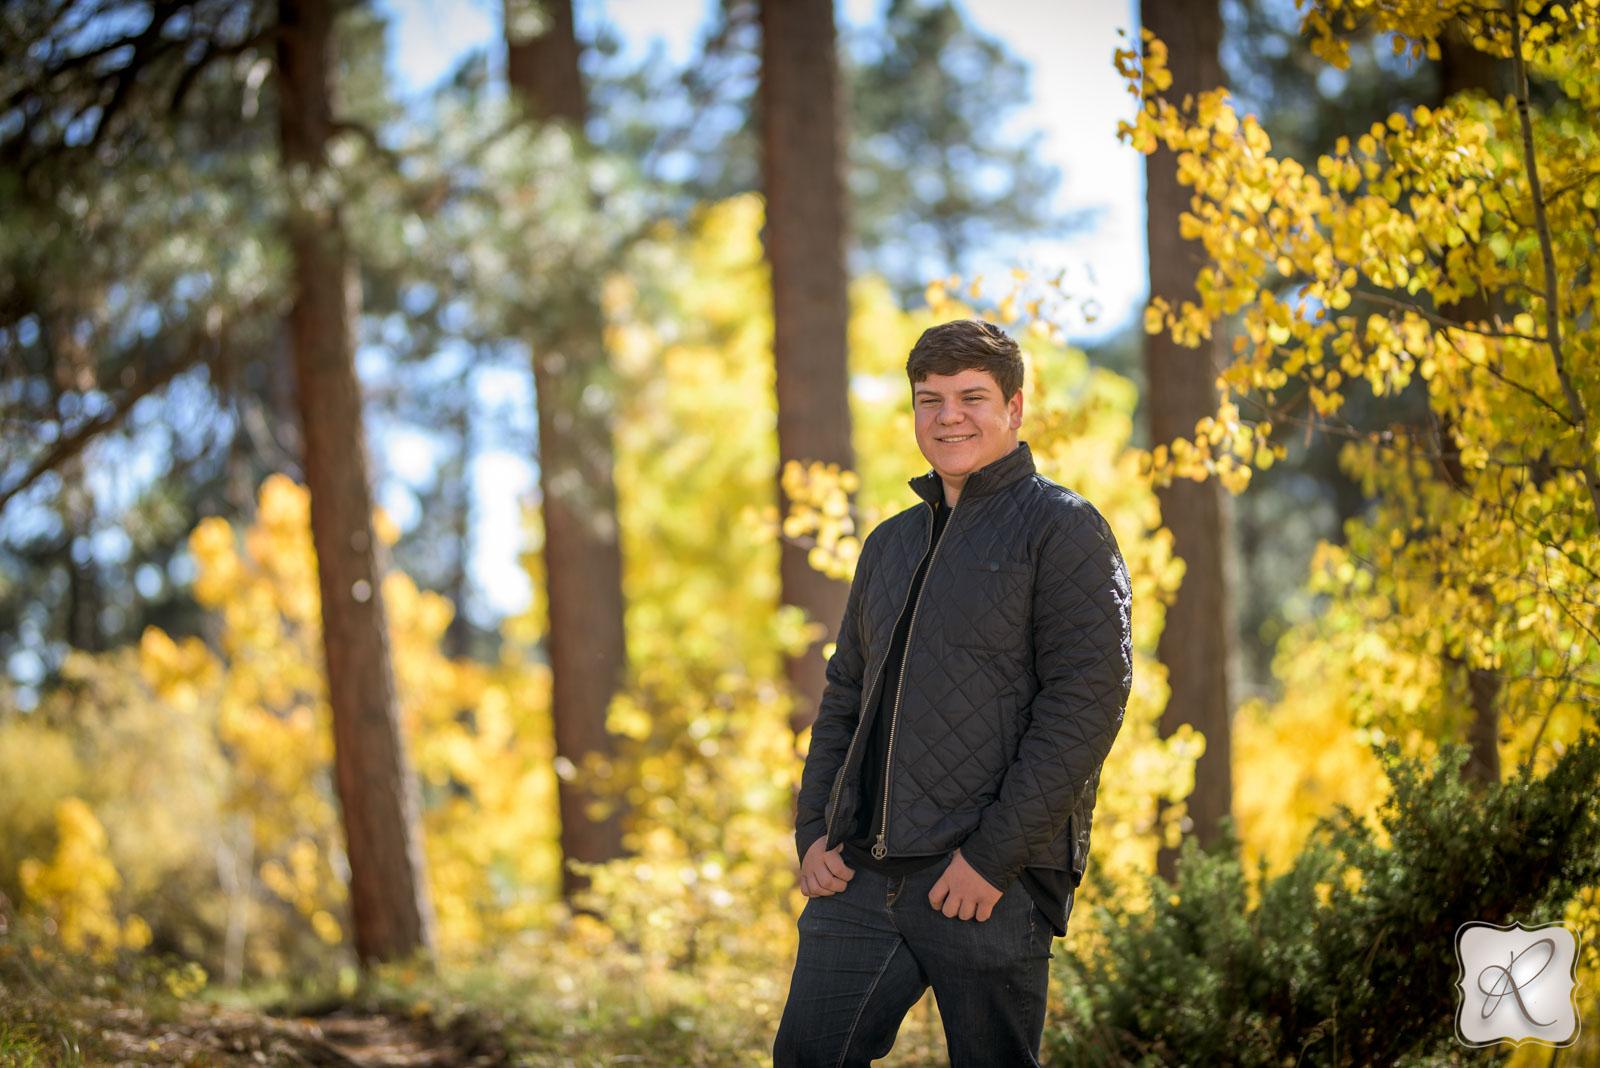 Allison Ragsdale Photography in Durango, Colorado